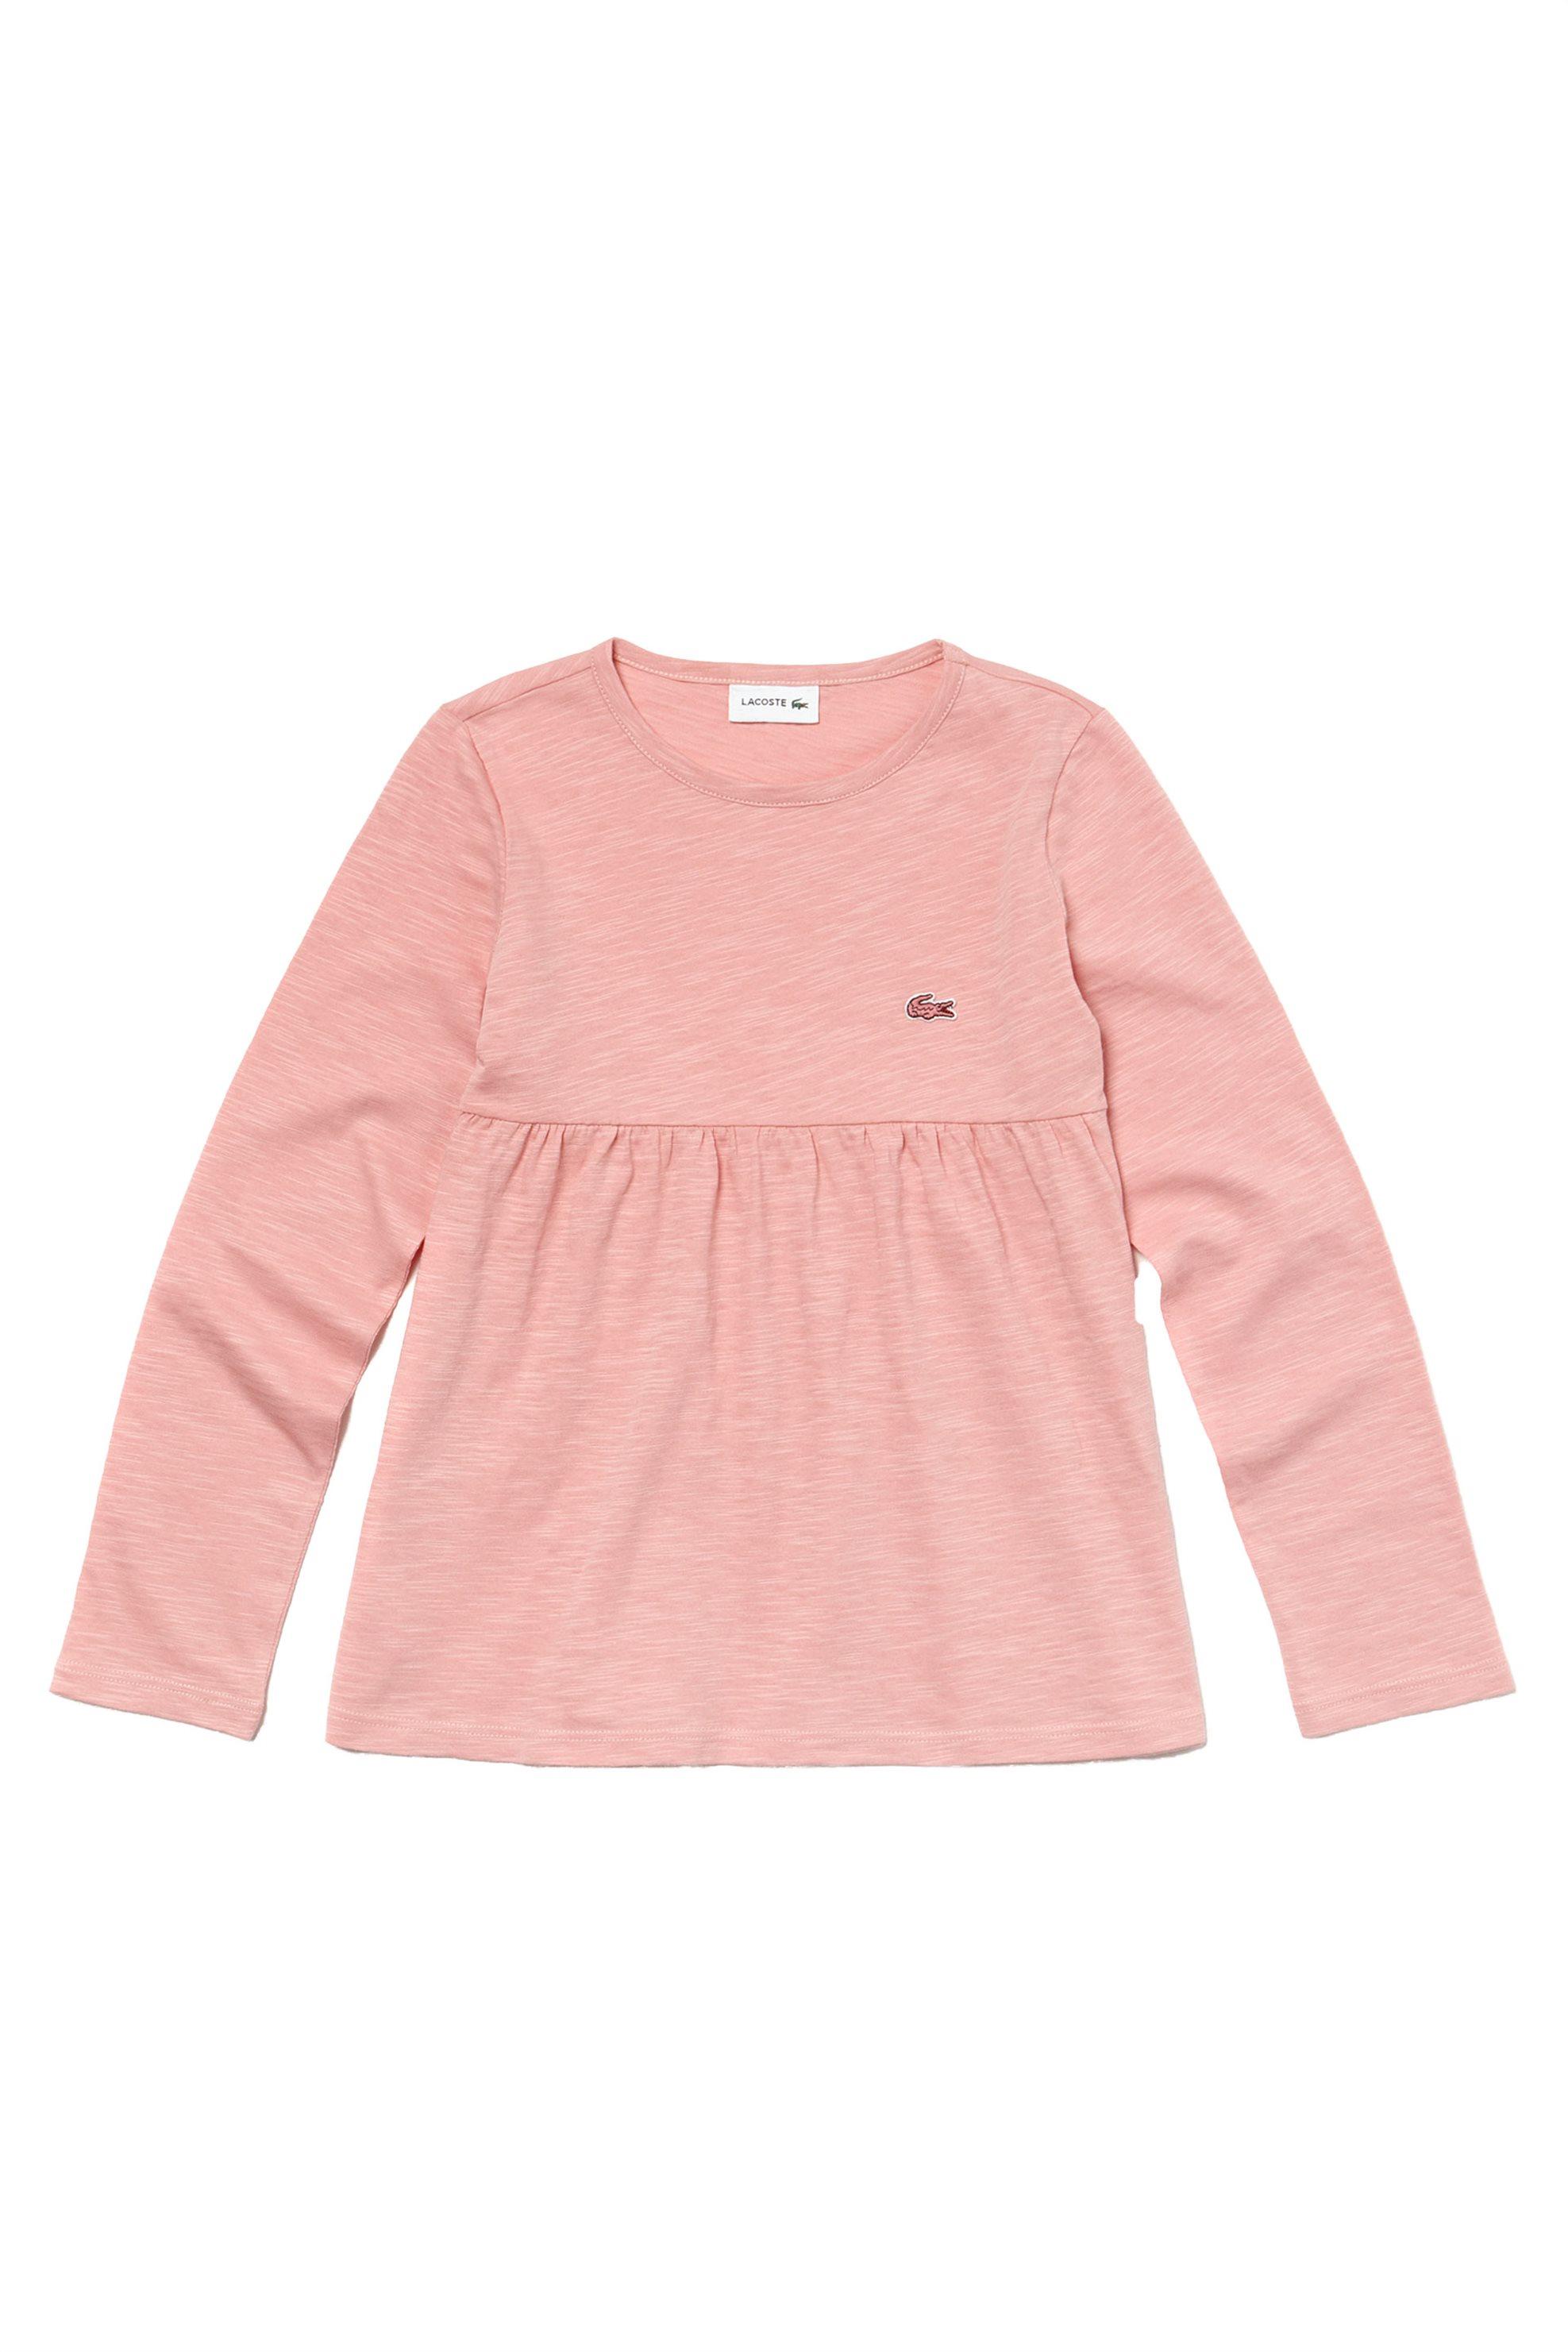 Lacoste παιδική μπλούζα μακρυμάνικη μονόχρωμη Kids Collection - TJ9802 - Σομον παιδι   κοριτσι   4 14 ετων   tops   παντελόνια   μπλούζες   πουκάμισα   μπλούζε